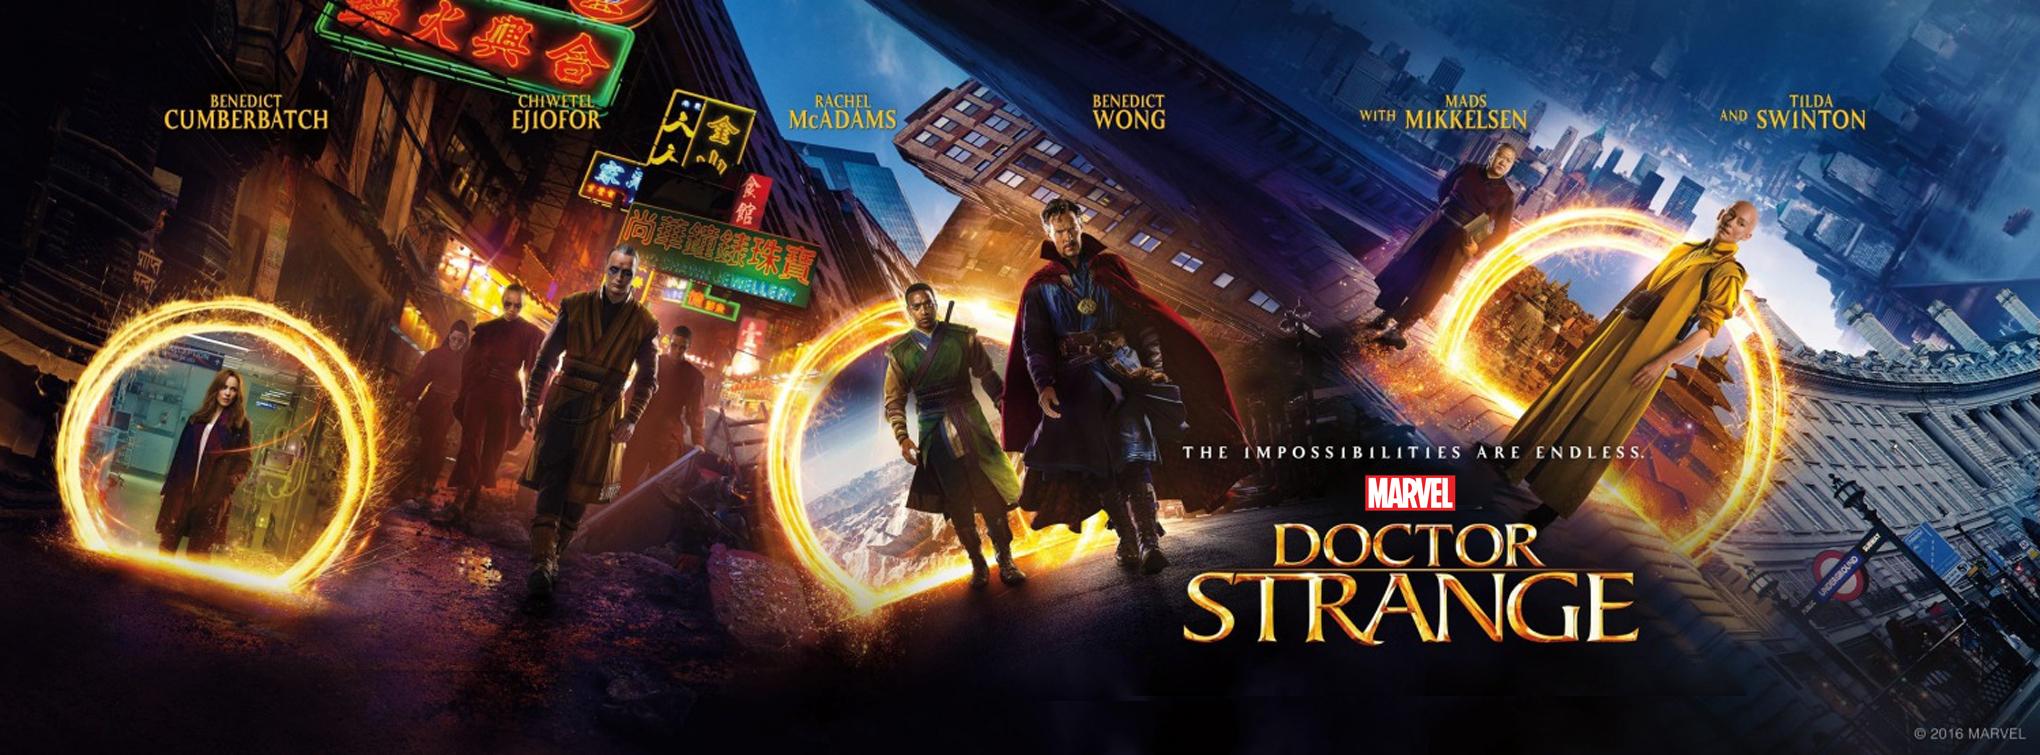 Doctor-Strange-Trailer-and-Info